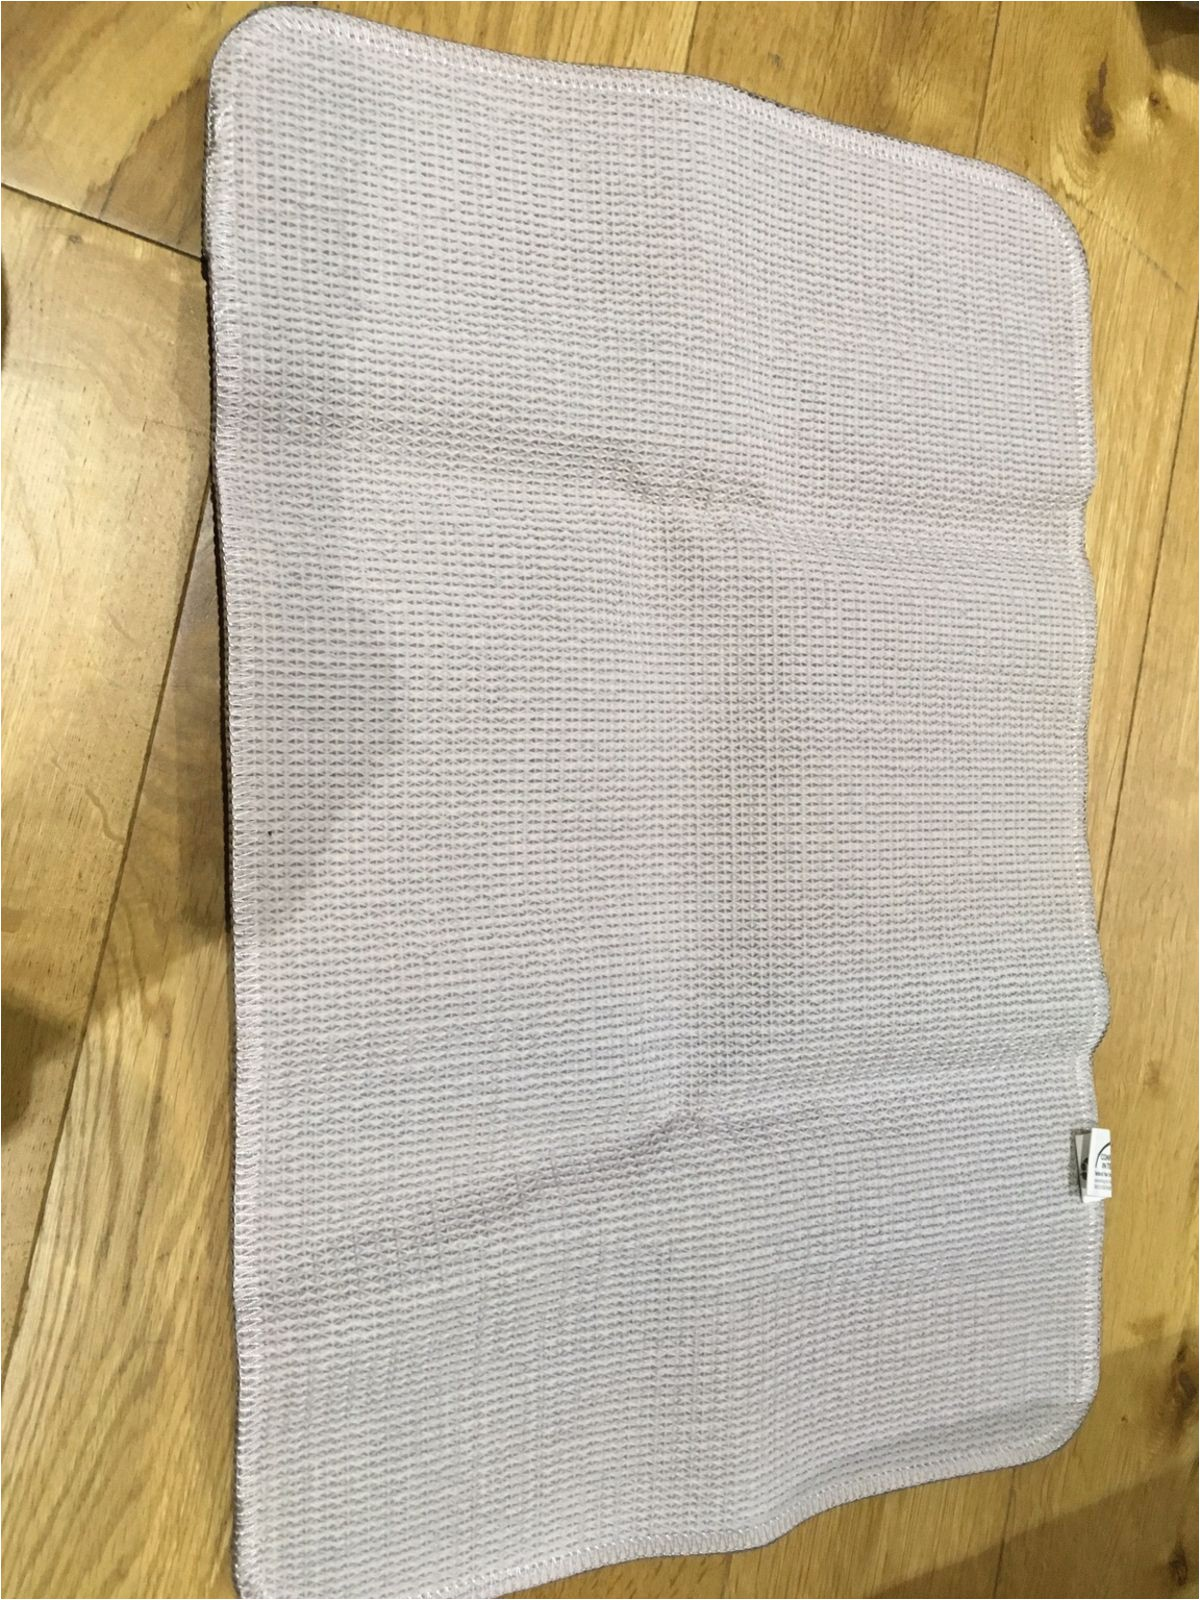 new non slip soft bath shower mat rug 40x60cm